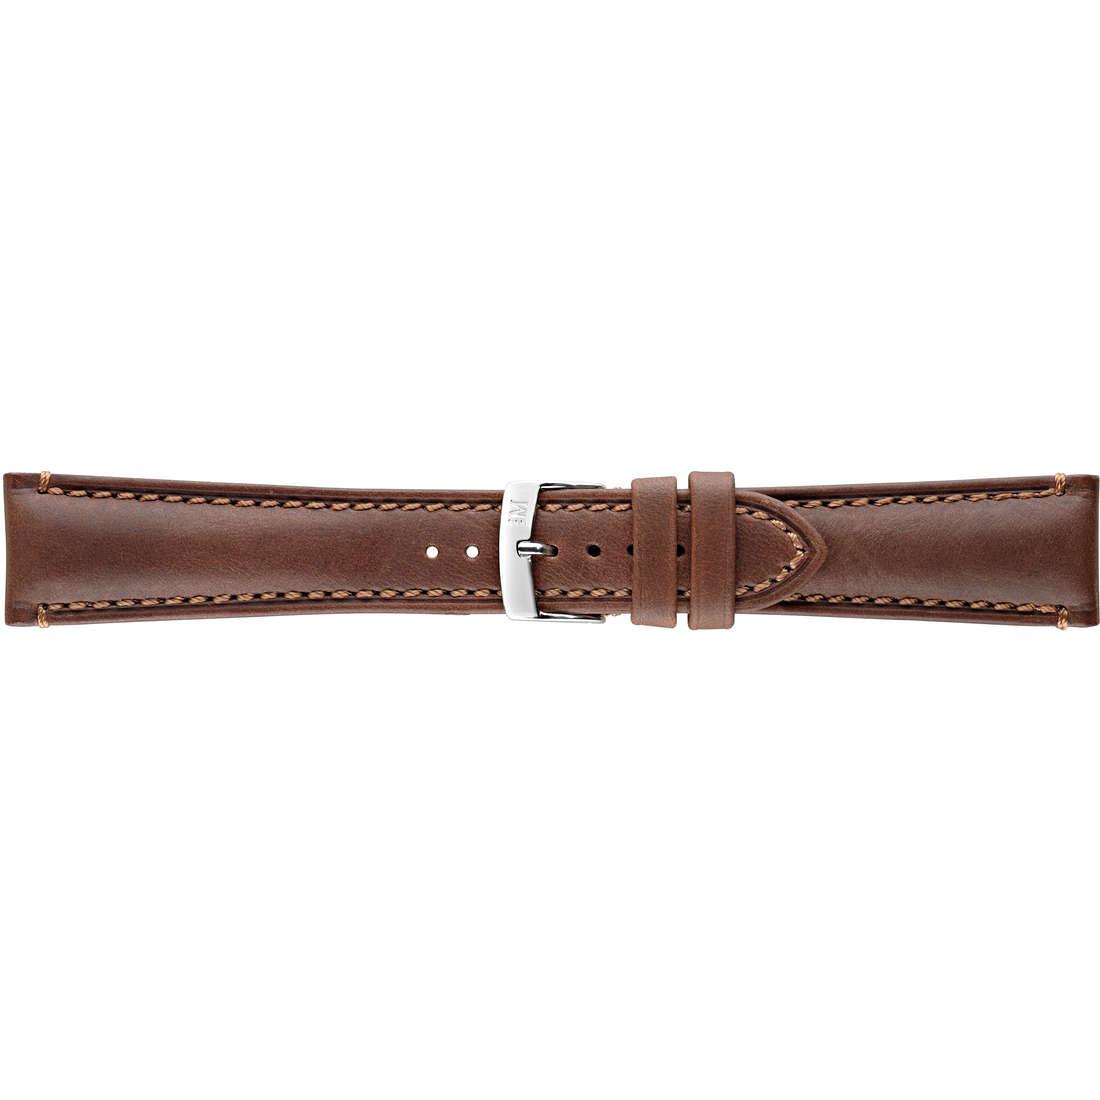 watch watch bands watch straps man Morellato Manufatti A01X4434B09032CR22